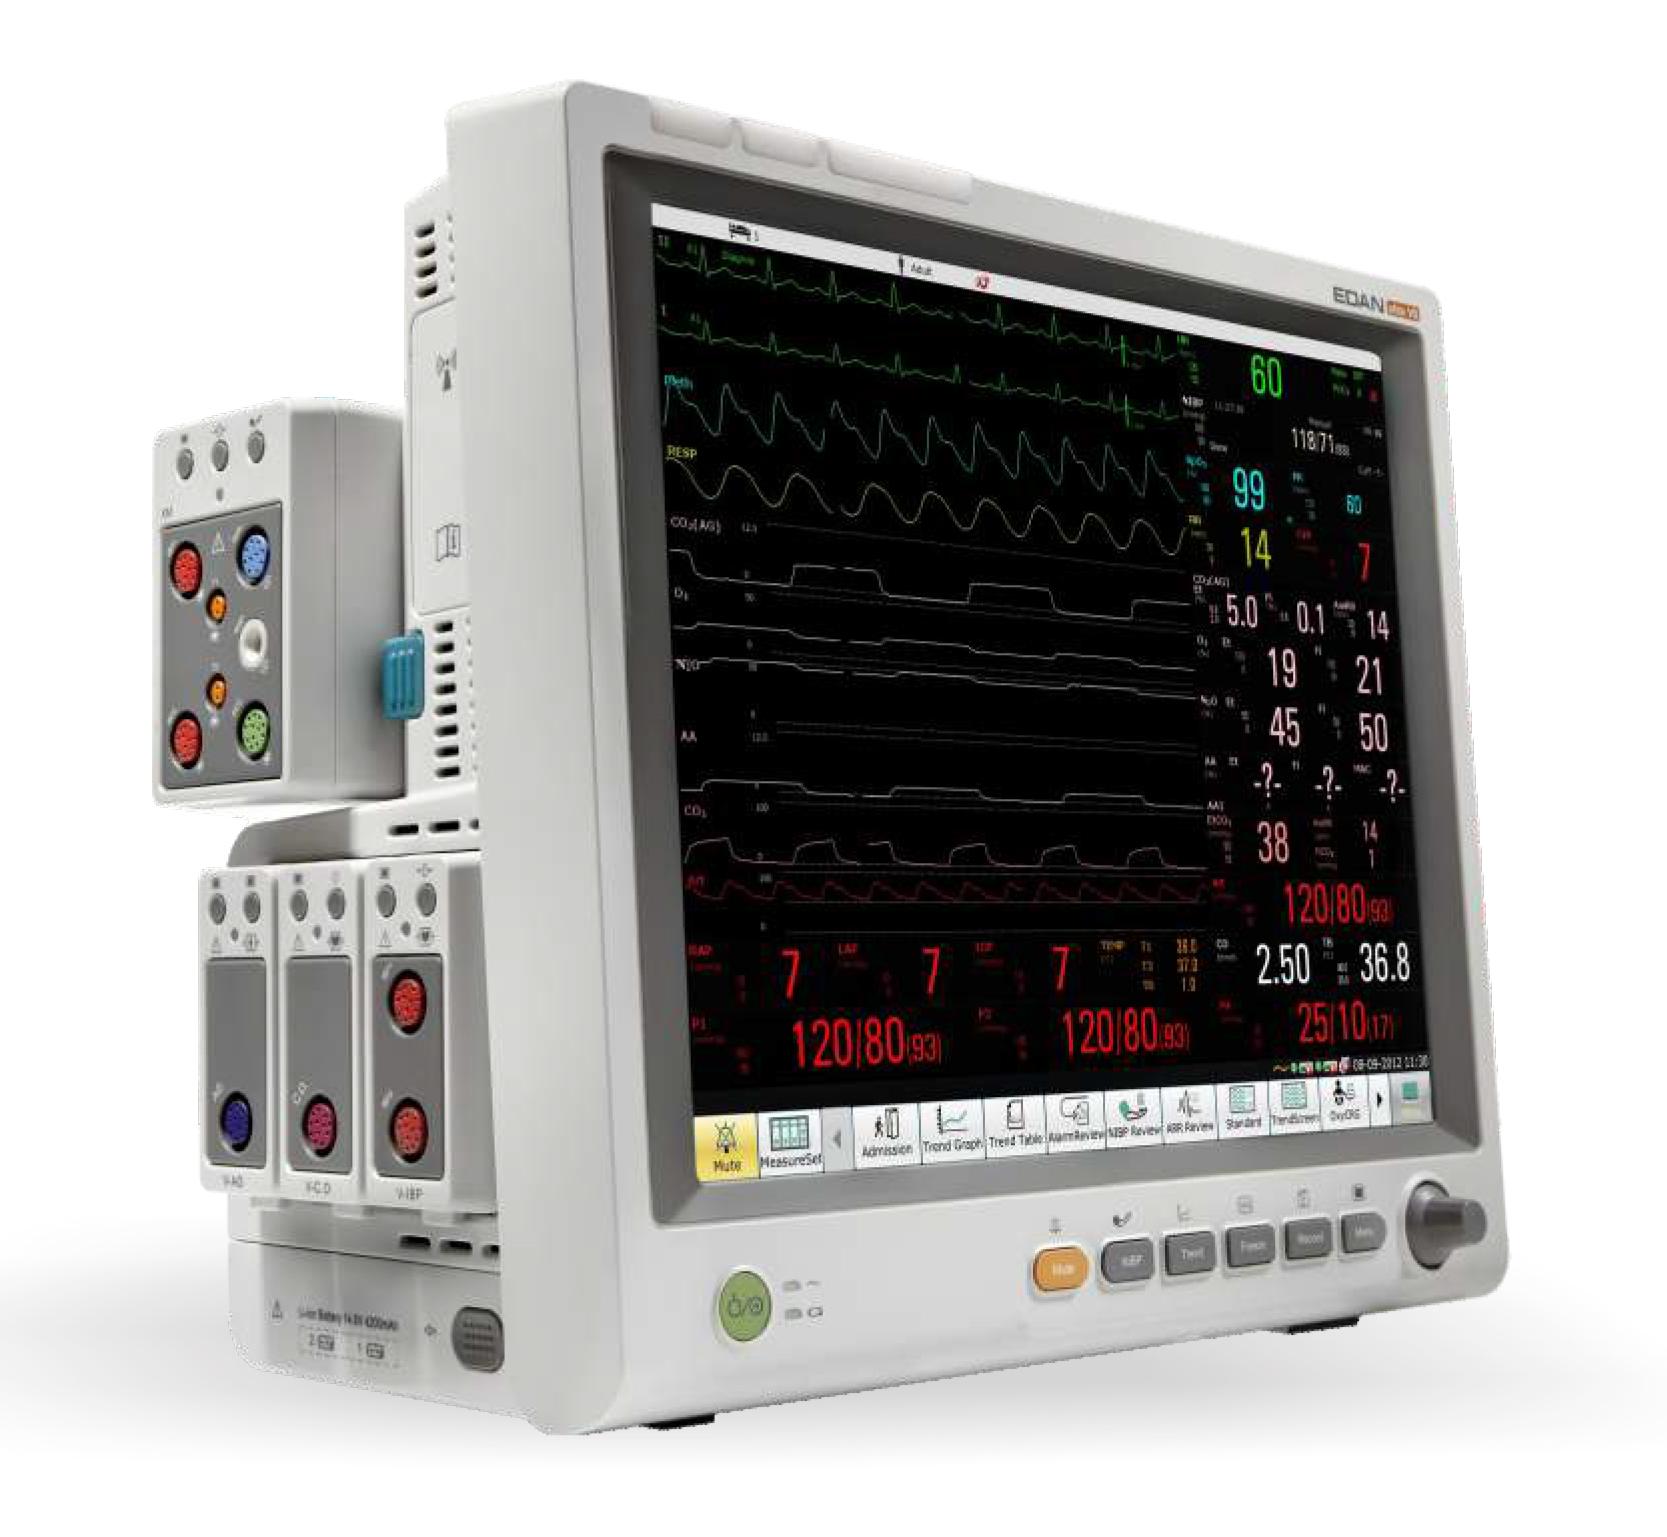 Monitor Multiparametros EDAN - V8x